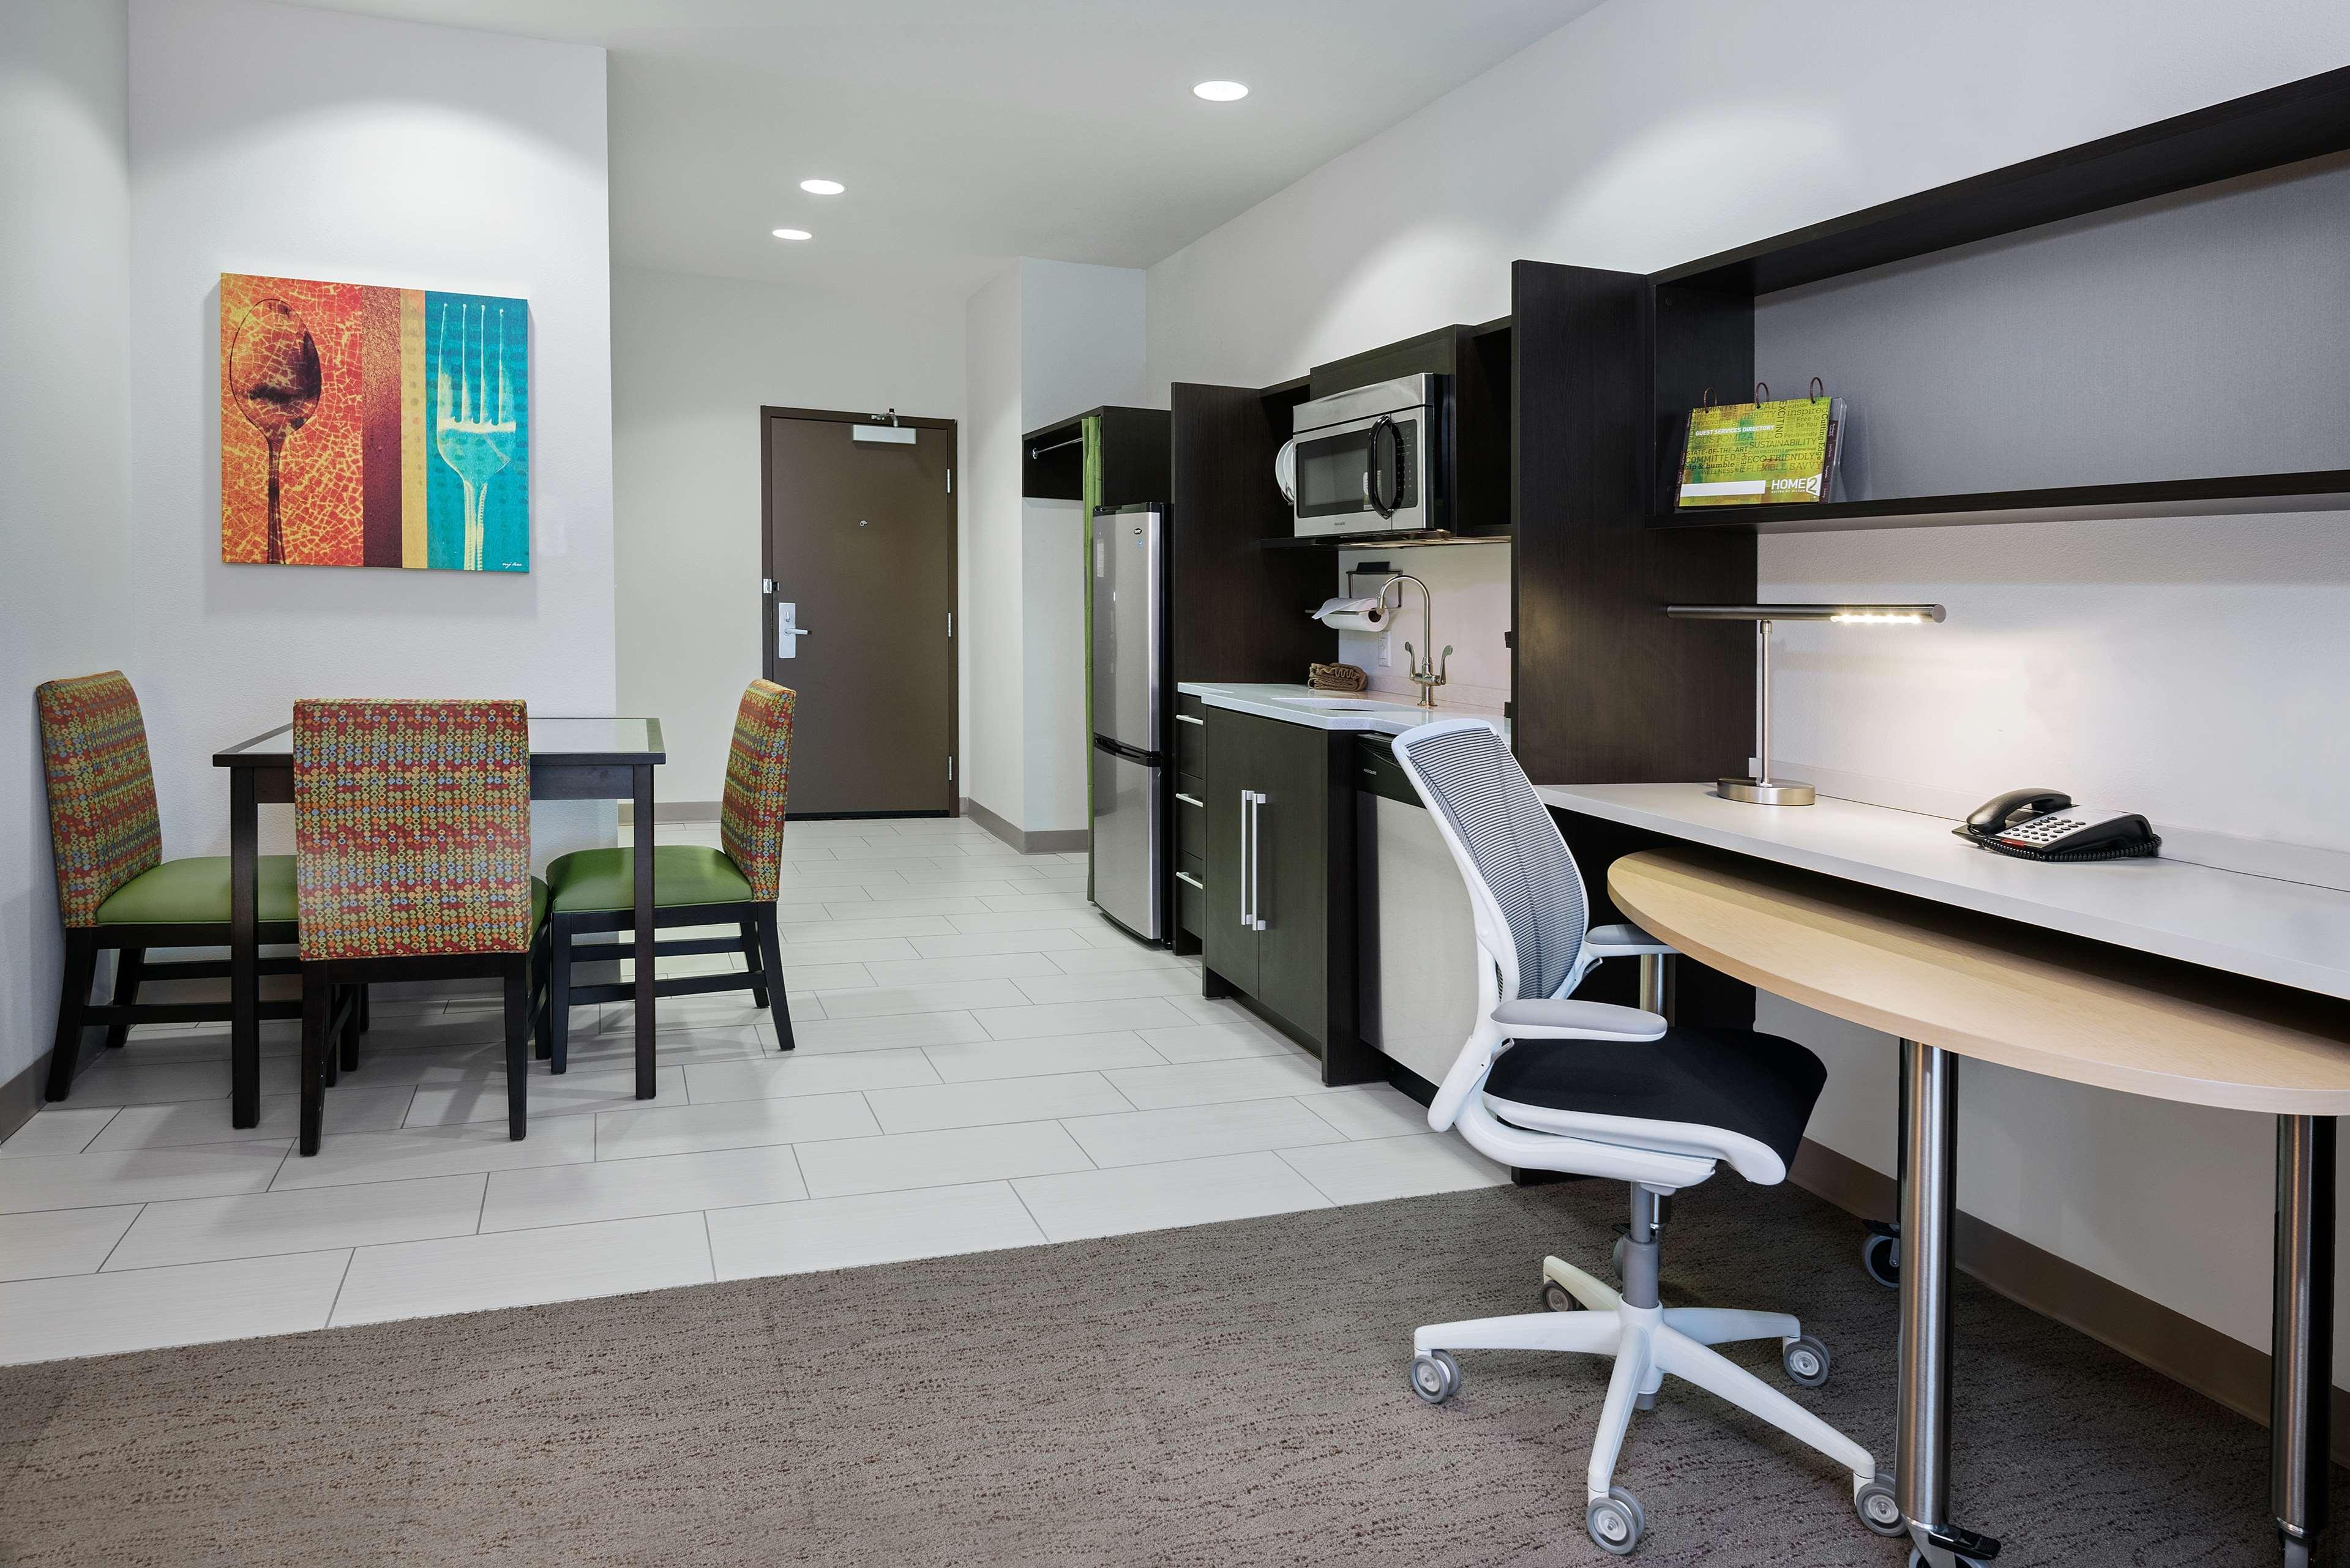 Home2 Suites by Hilton Austin Airport image 21